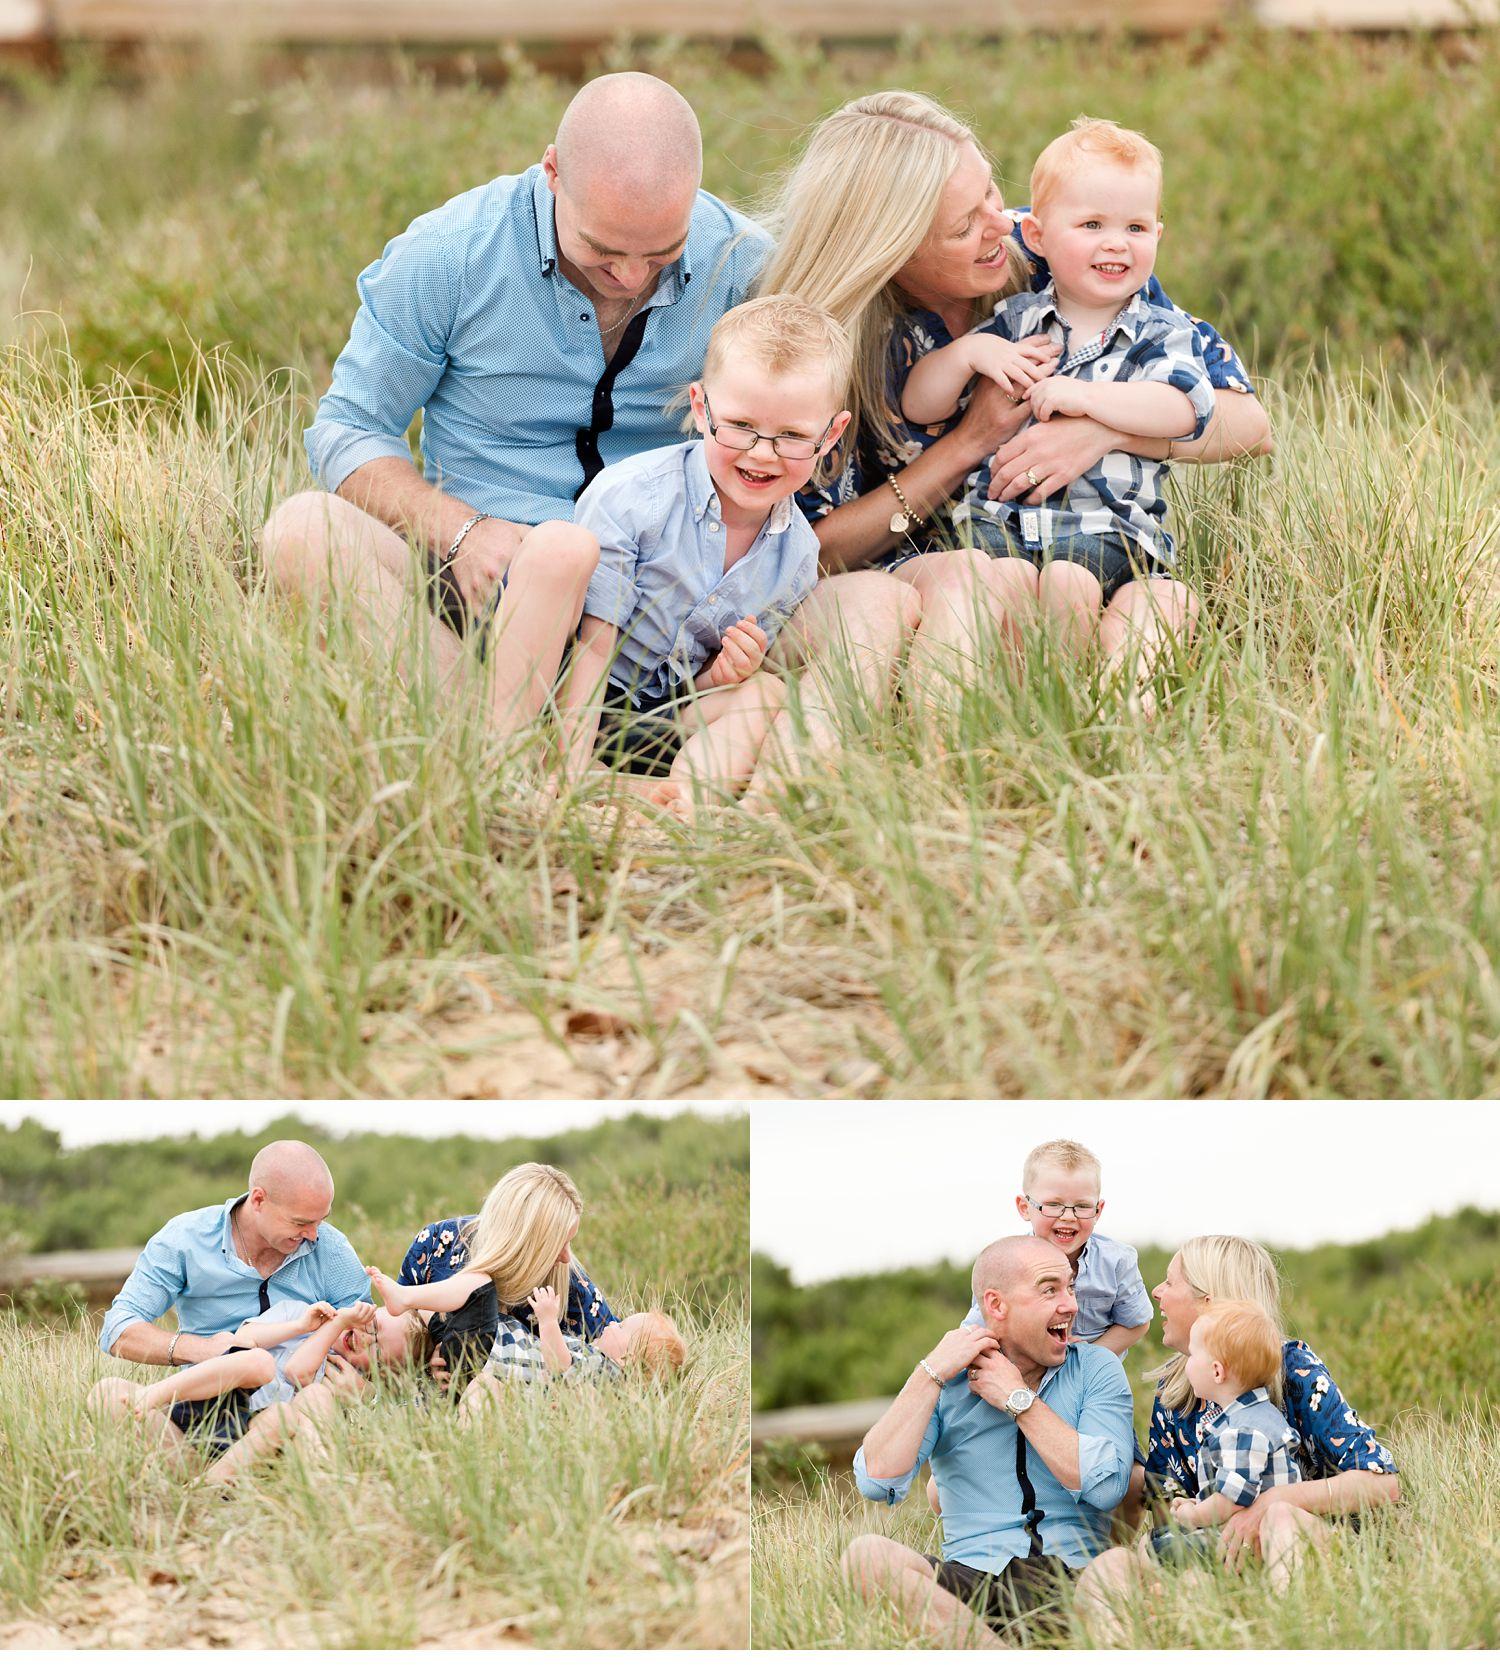 happy-family-photo-bec-stewart-photography.jpg